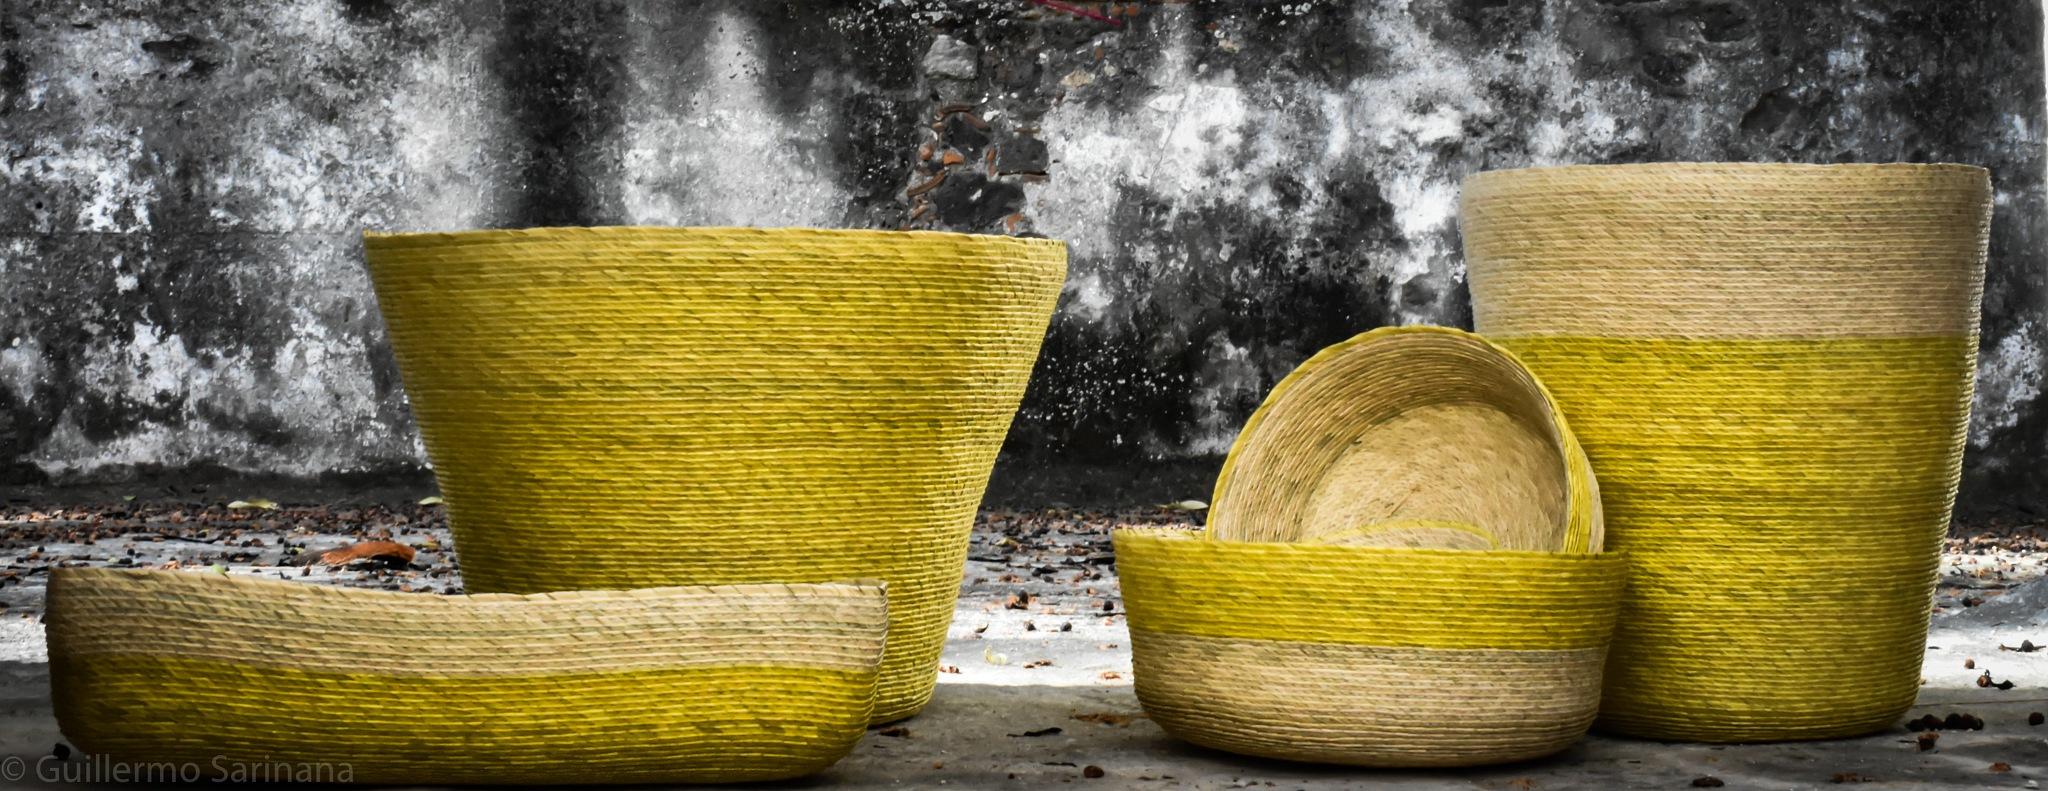 Hand made baskets by Guillermo Sariñana Siller